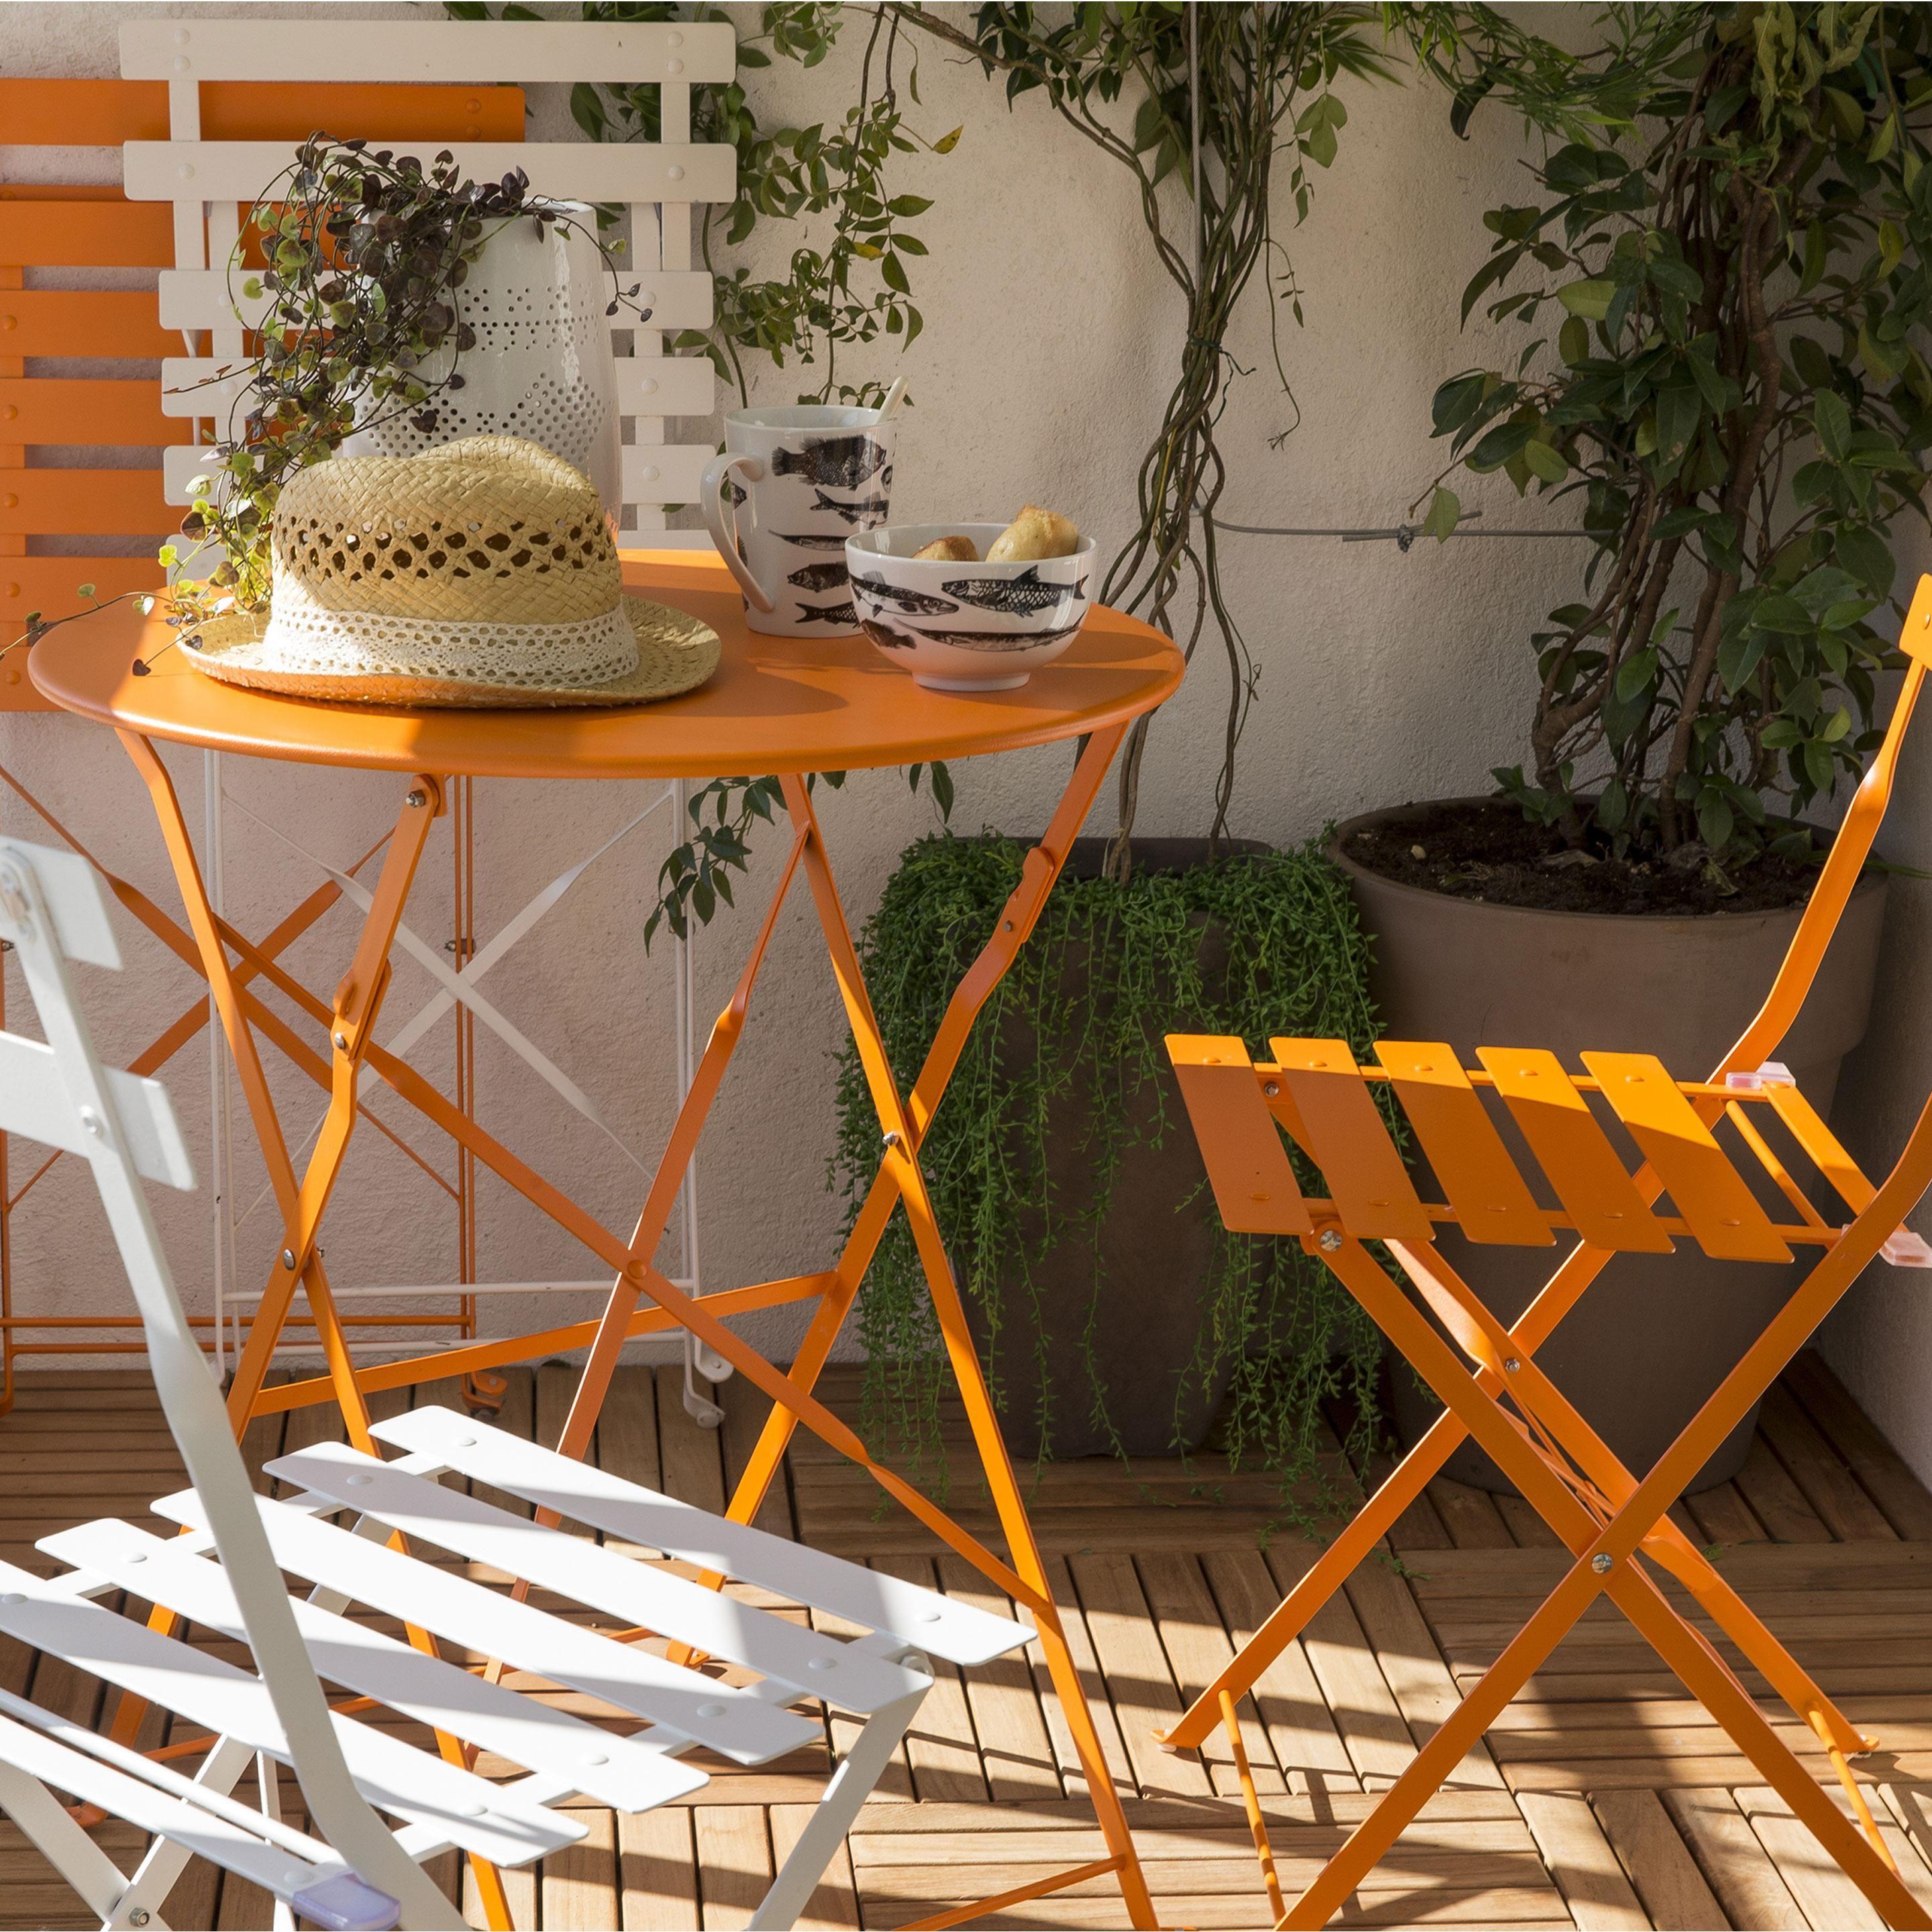 Table Repas 2 Personnes table de jardin de repas flore ronde orange 2 personnes no